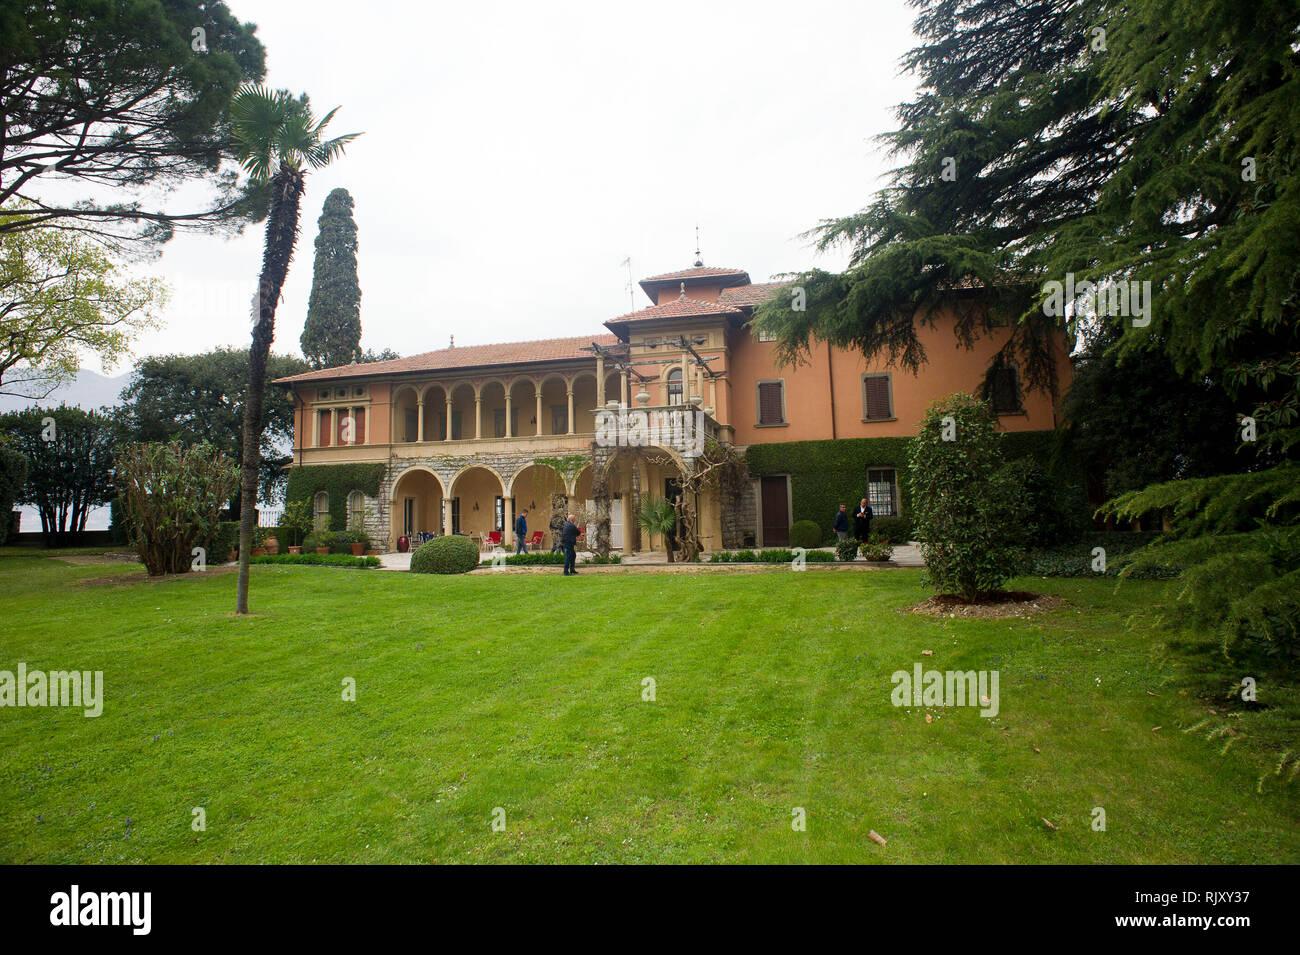 Italy, Lombardy, Sulzano (BS) Lago d'Iseo, island of S, Paolo, Pietro Beretta, (Fabbrica d'Armi Pietro Beretta SpA) in the garden of Villa S. Paolo on - Stock Image